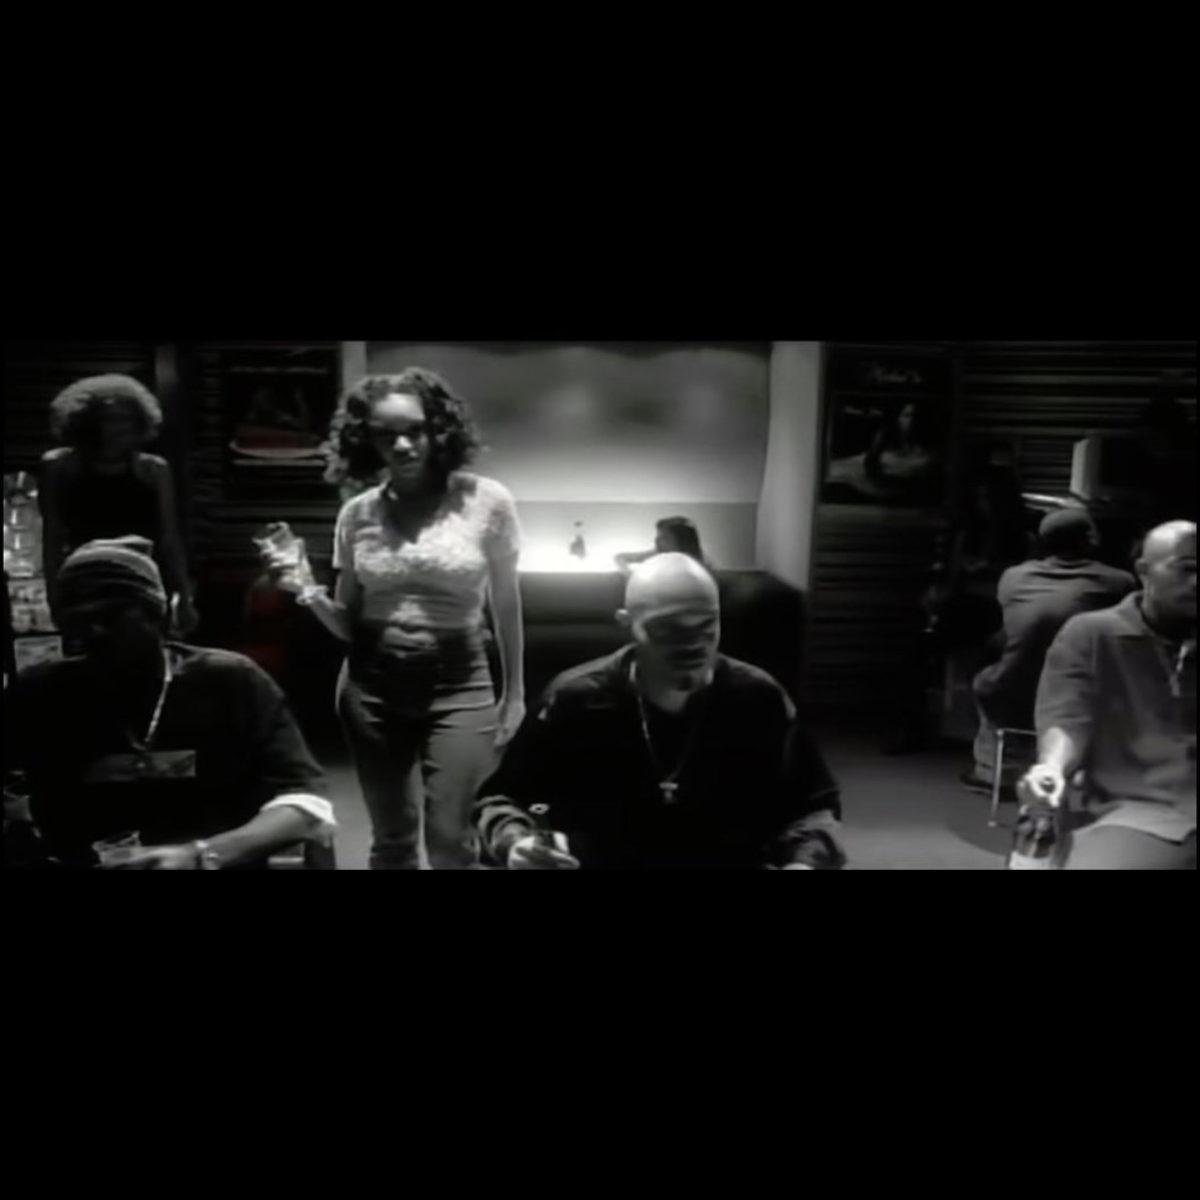 2Pac - Unconditional Love (Thumbnail)